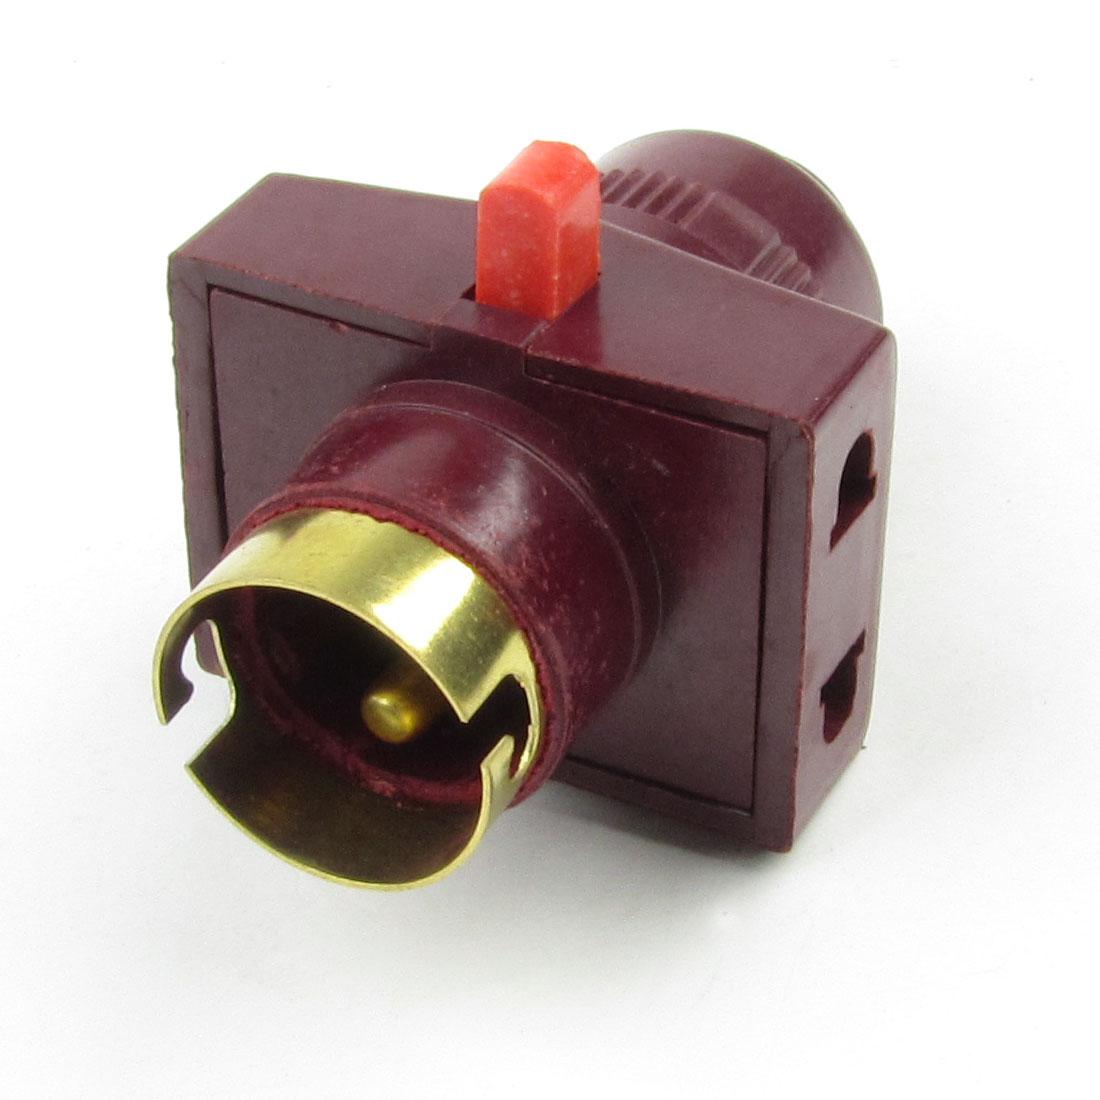 Burgundy Gold Tone Plastic Case B22 Socket Bulb Lamp Holder 6A 220V